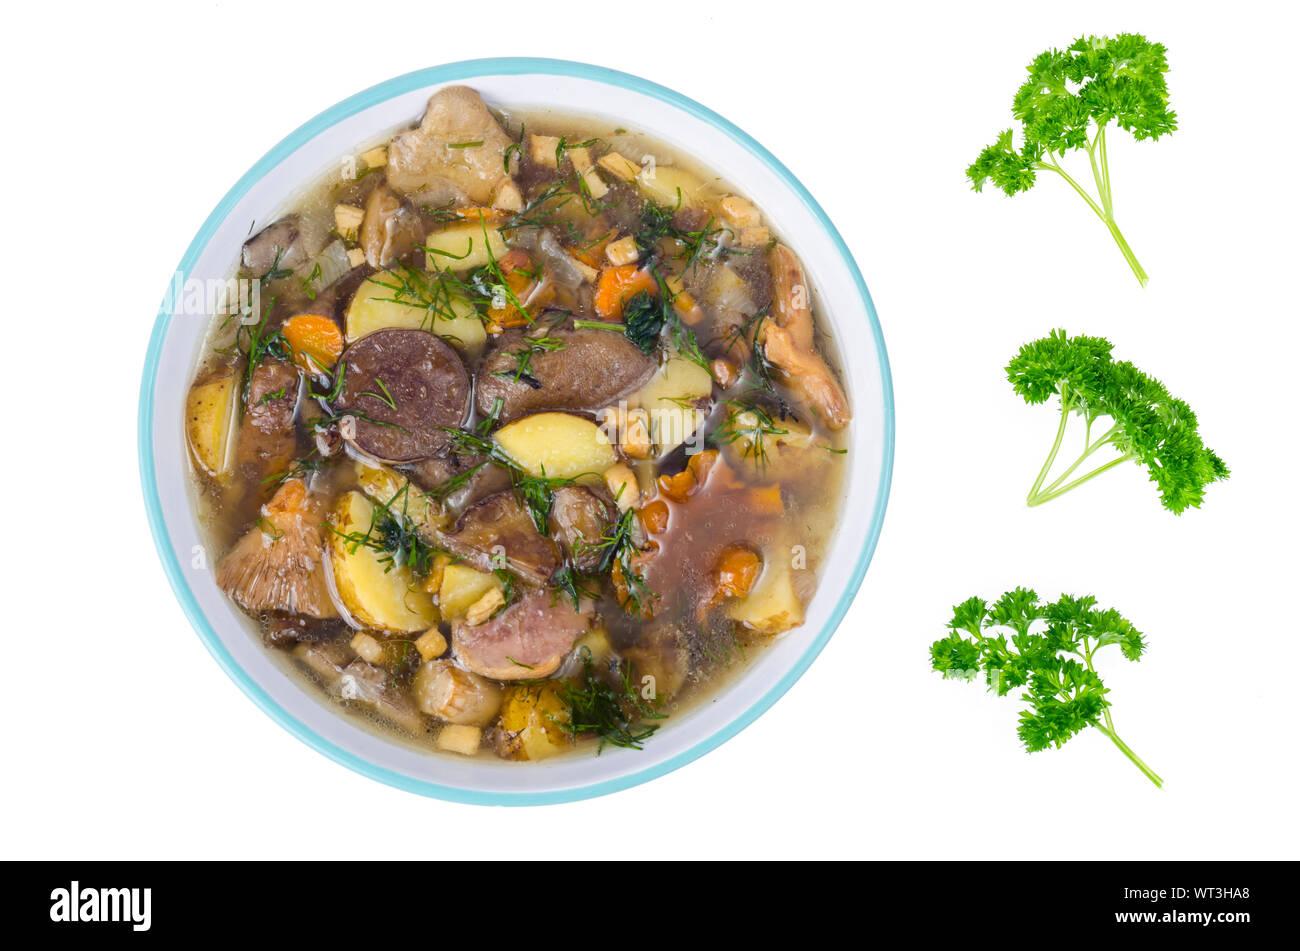 Delicious seasonal wild mushroom soup. Studio Photo Stock Photo